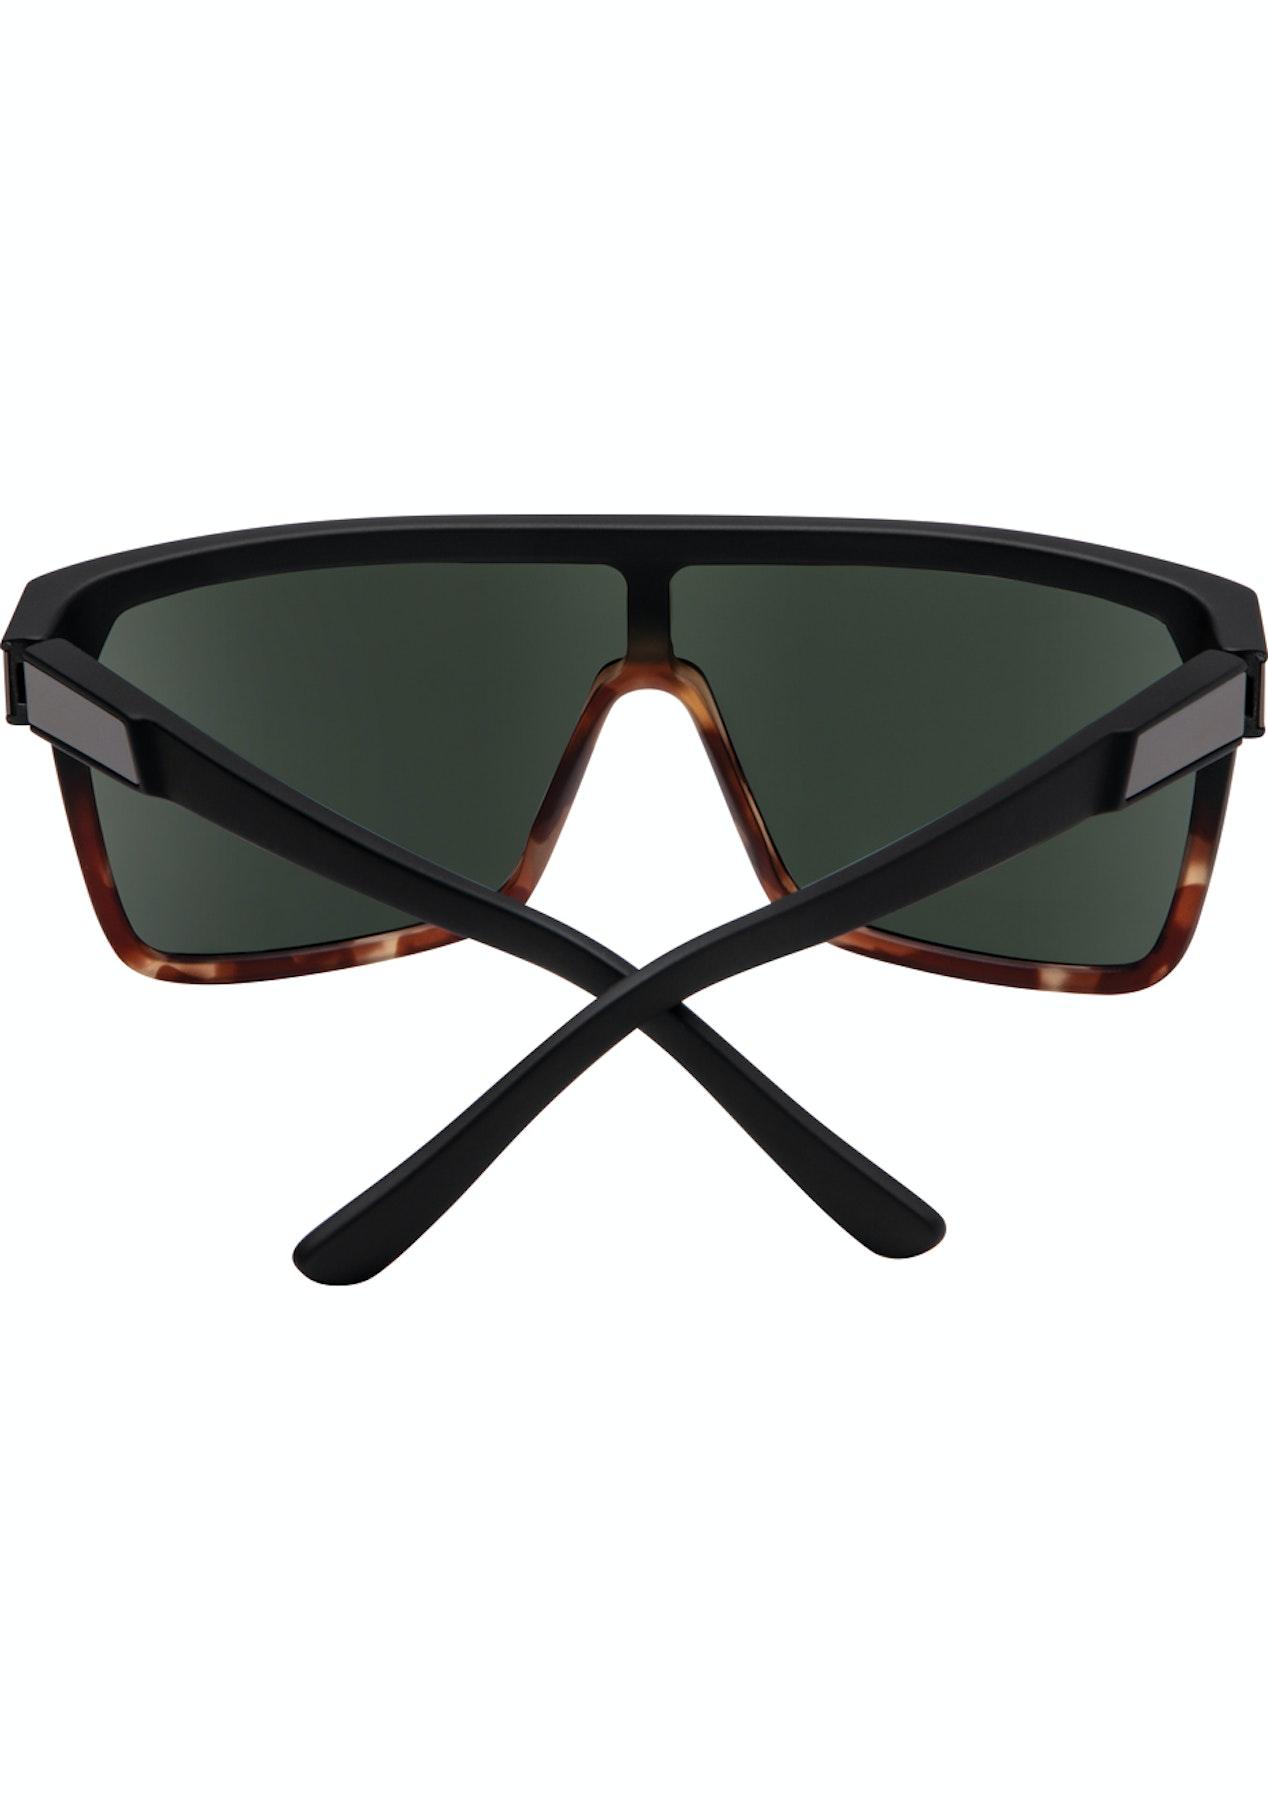 4d71fad4febd SPY Flynn Sunglasses - Soft Matte Black Tort Fade- Happy Grey Green - Quay  Eyewear   More - Onceit